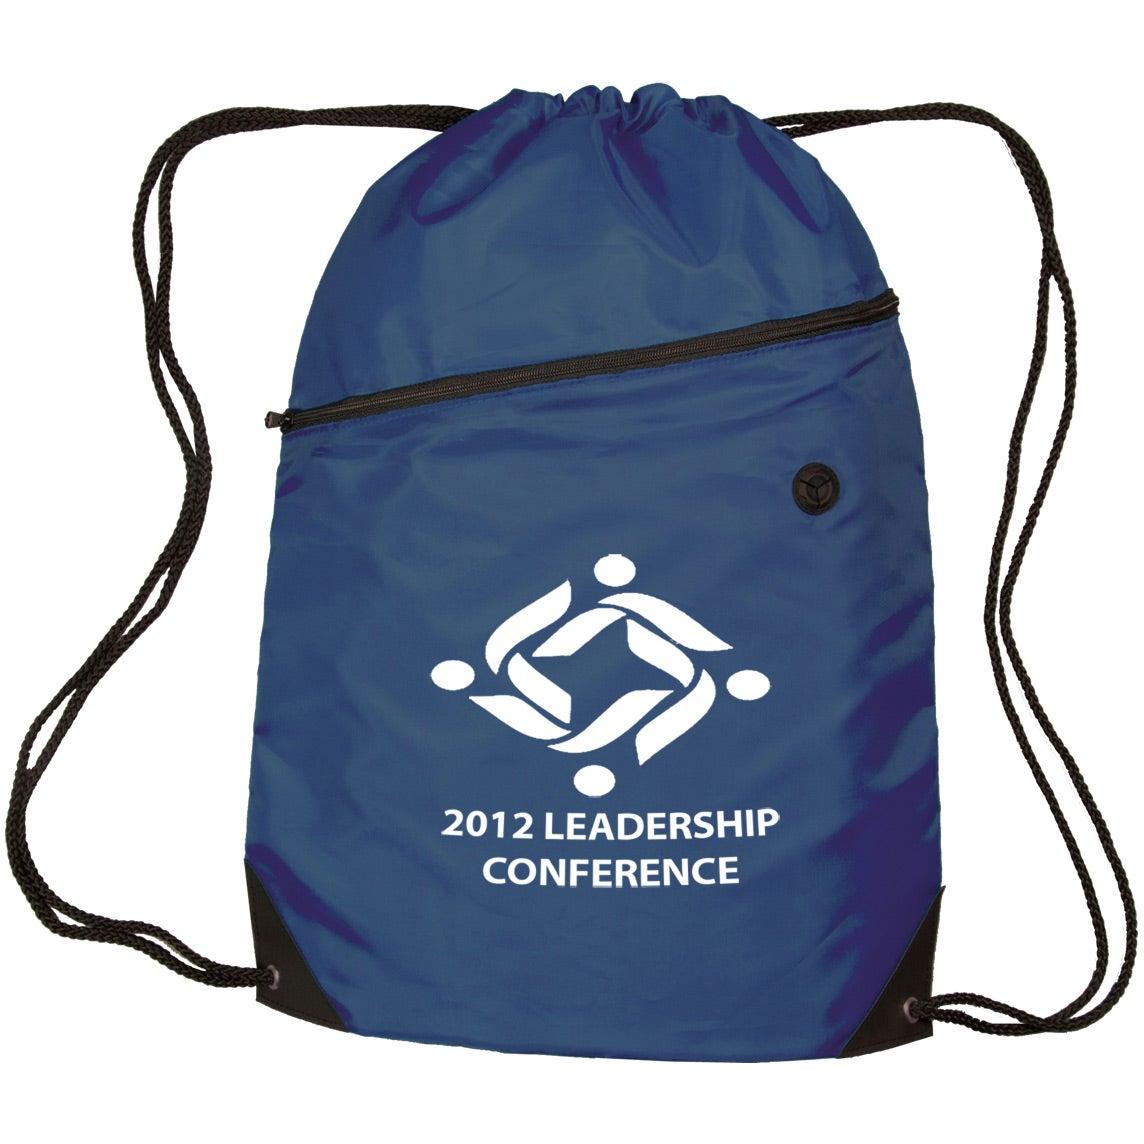 Promotional Luna Polyester Drawstring Backpacks With Custom Logo For Bag Shark 199 Ea